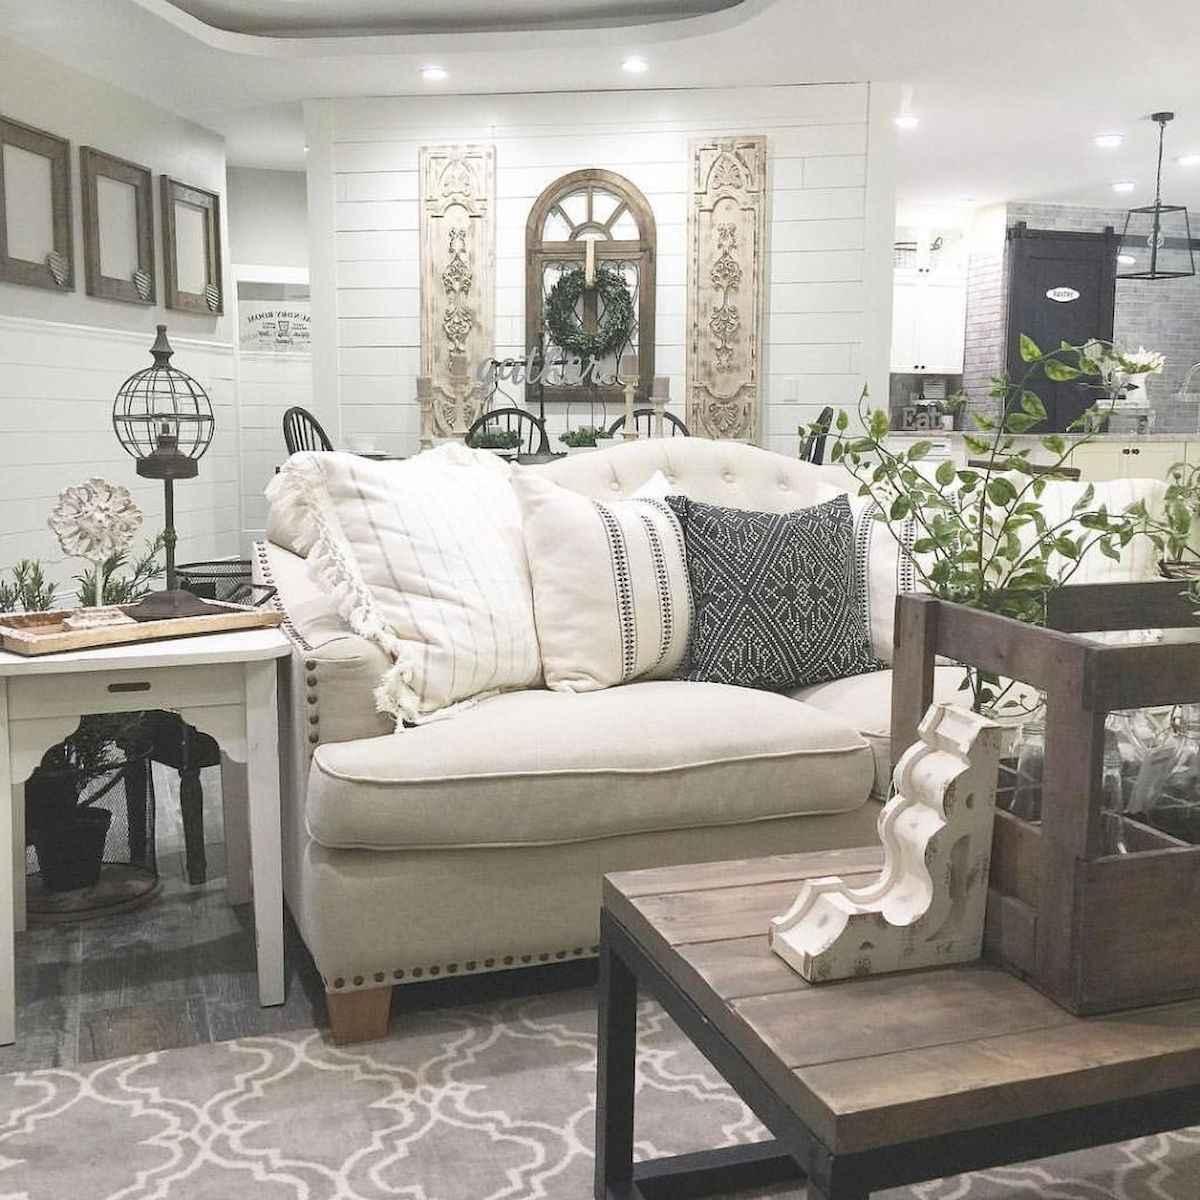 80 Awesome Modern Farmhouse Staircase Decor Ideas: 60 Modern Farmhouse Living Room Decor Ideas (27